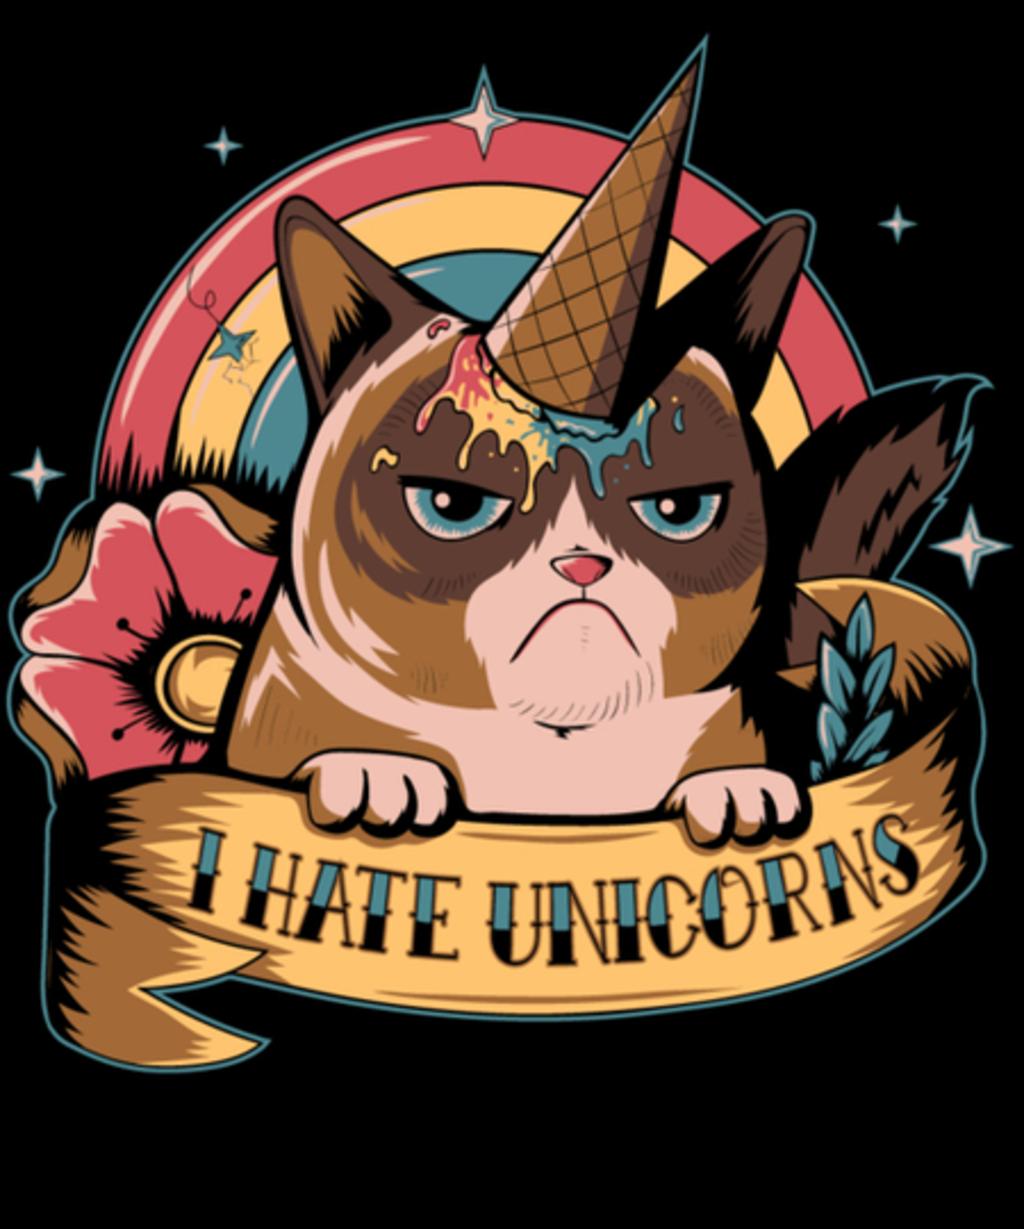 Qwertee: I hate unicorns!